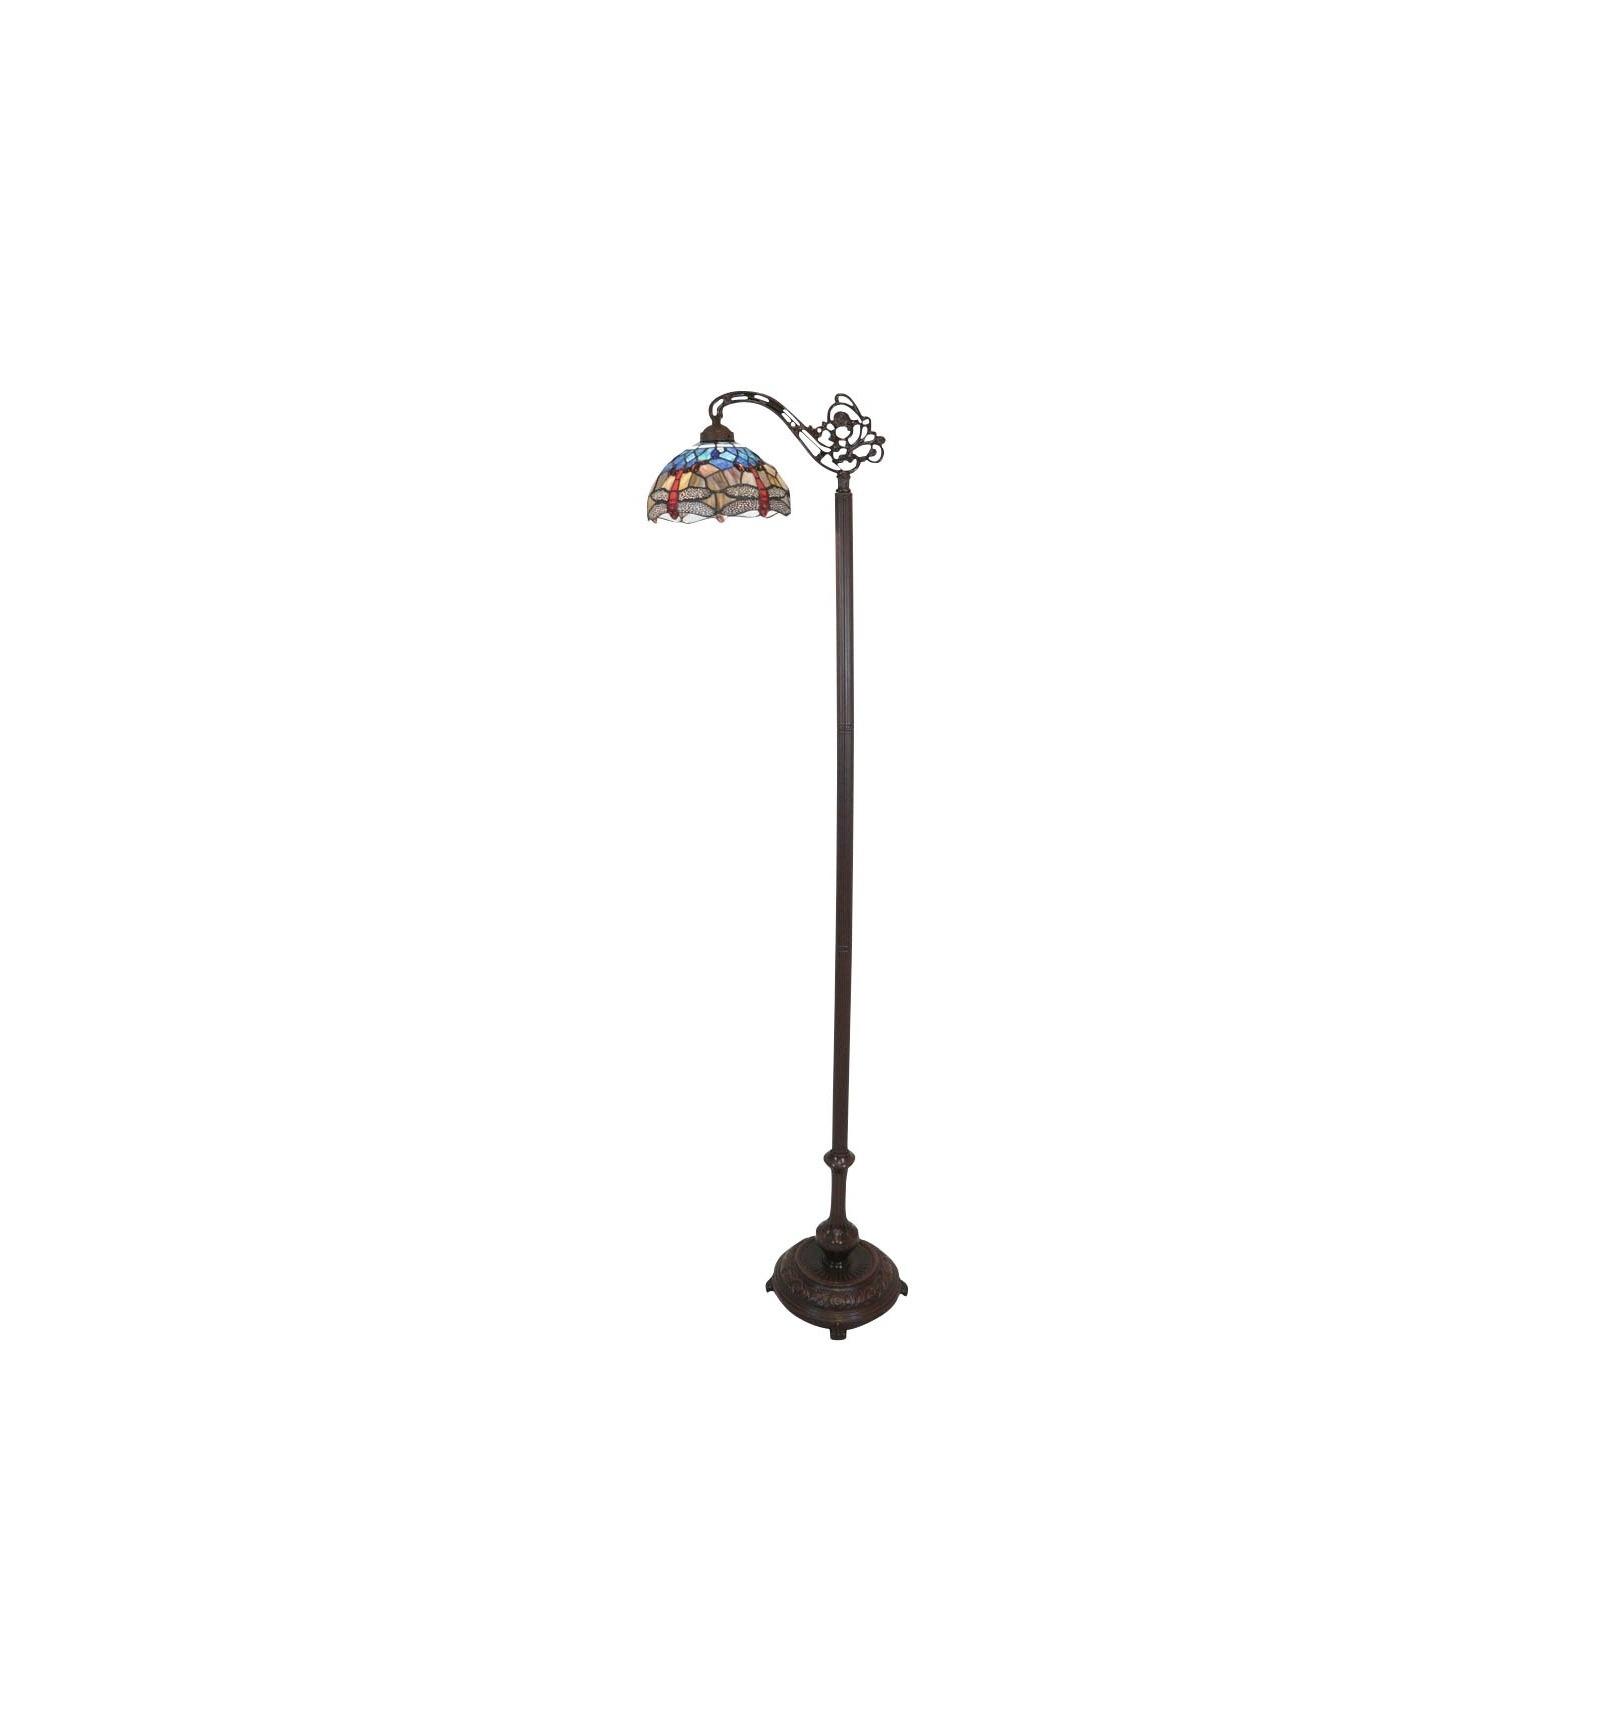 tiffany floor lamp dragonfly wall sconces. Black Bedroom Furniture Sets. Home Design Ideas